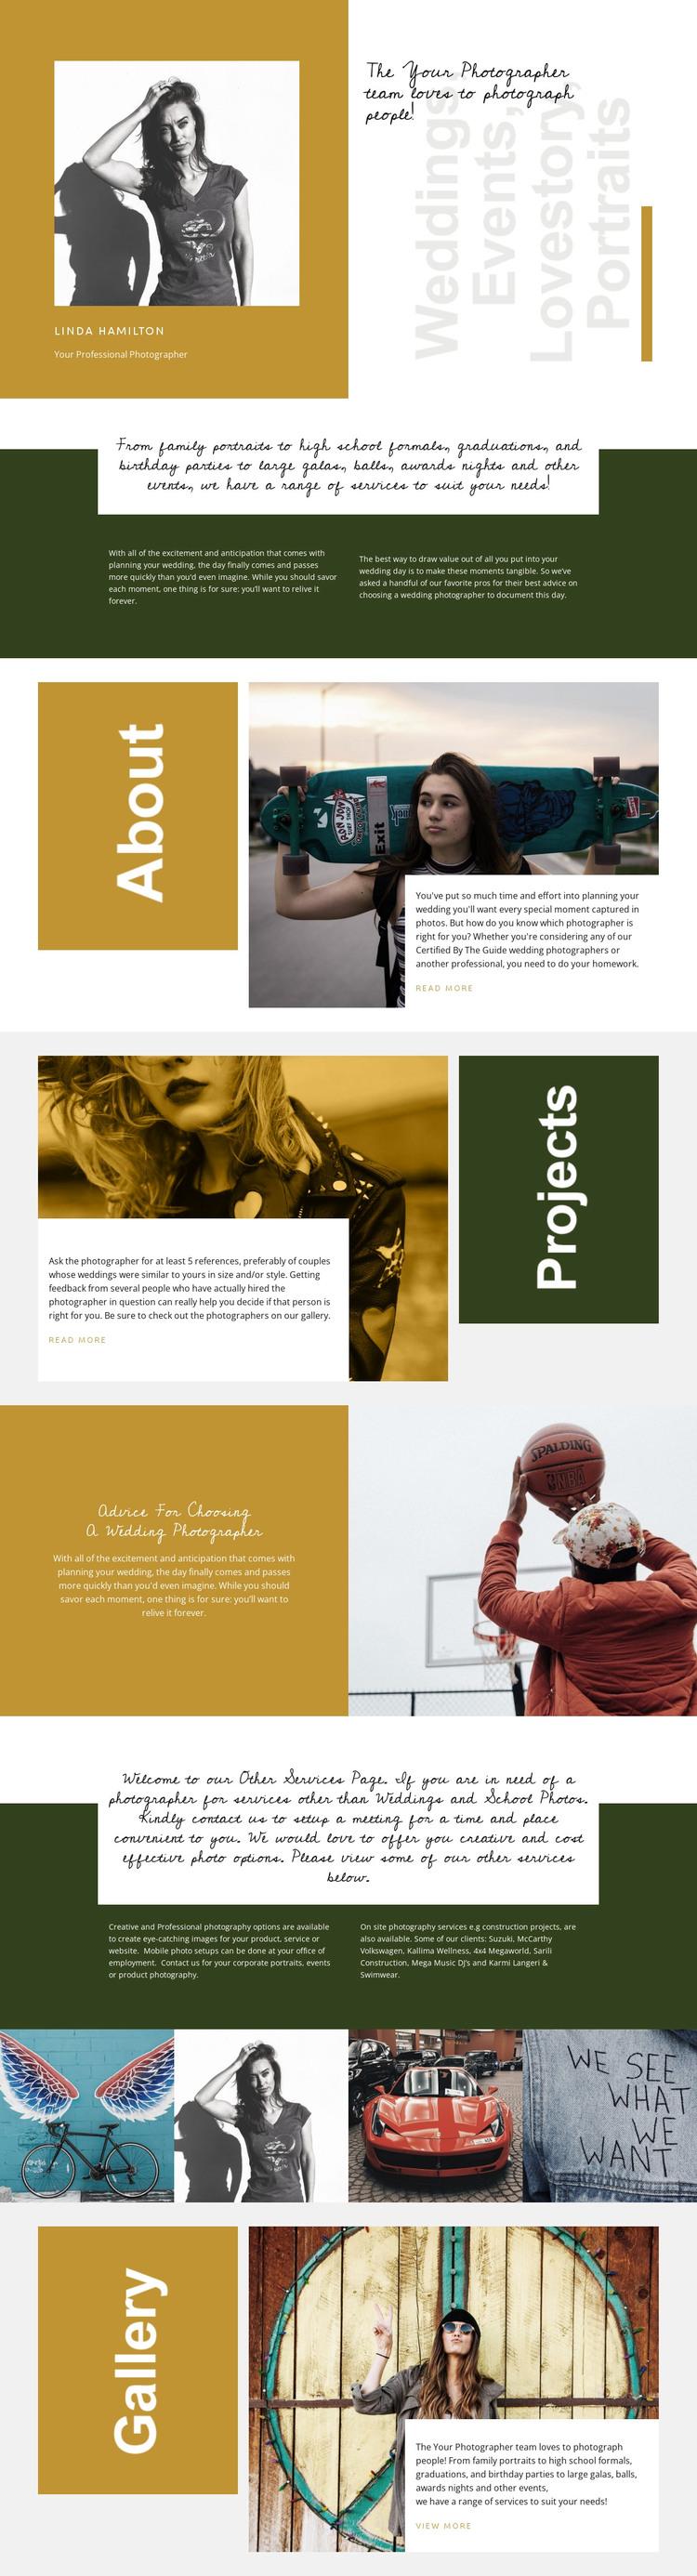 Fashion photography courses WordPress Theme